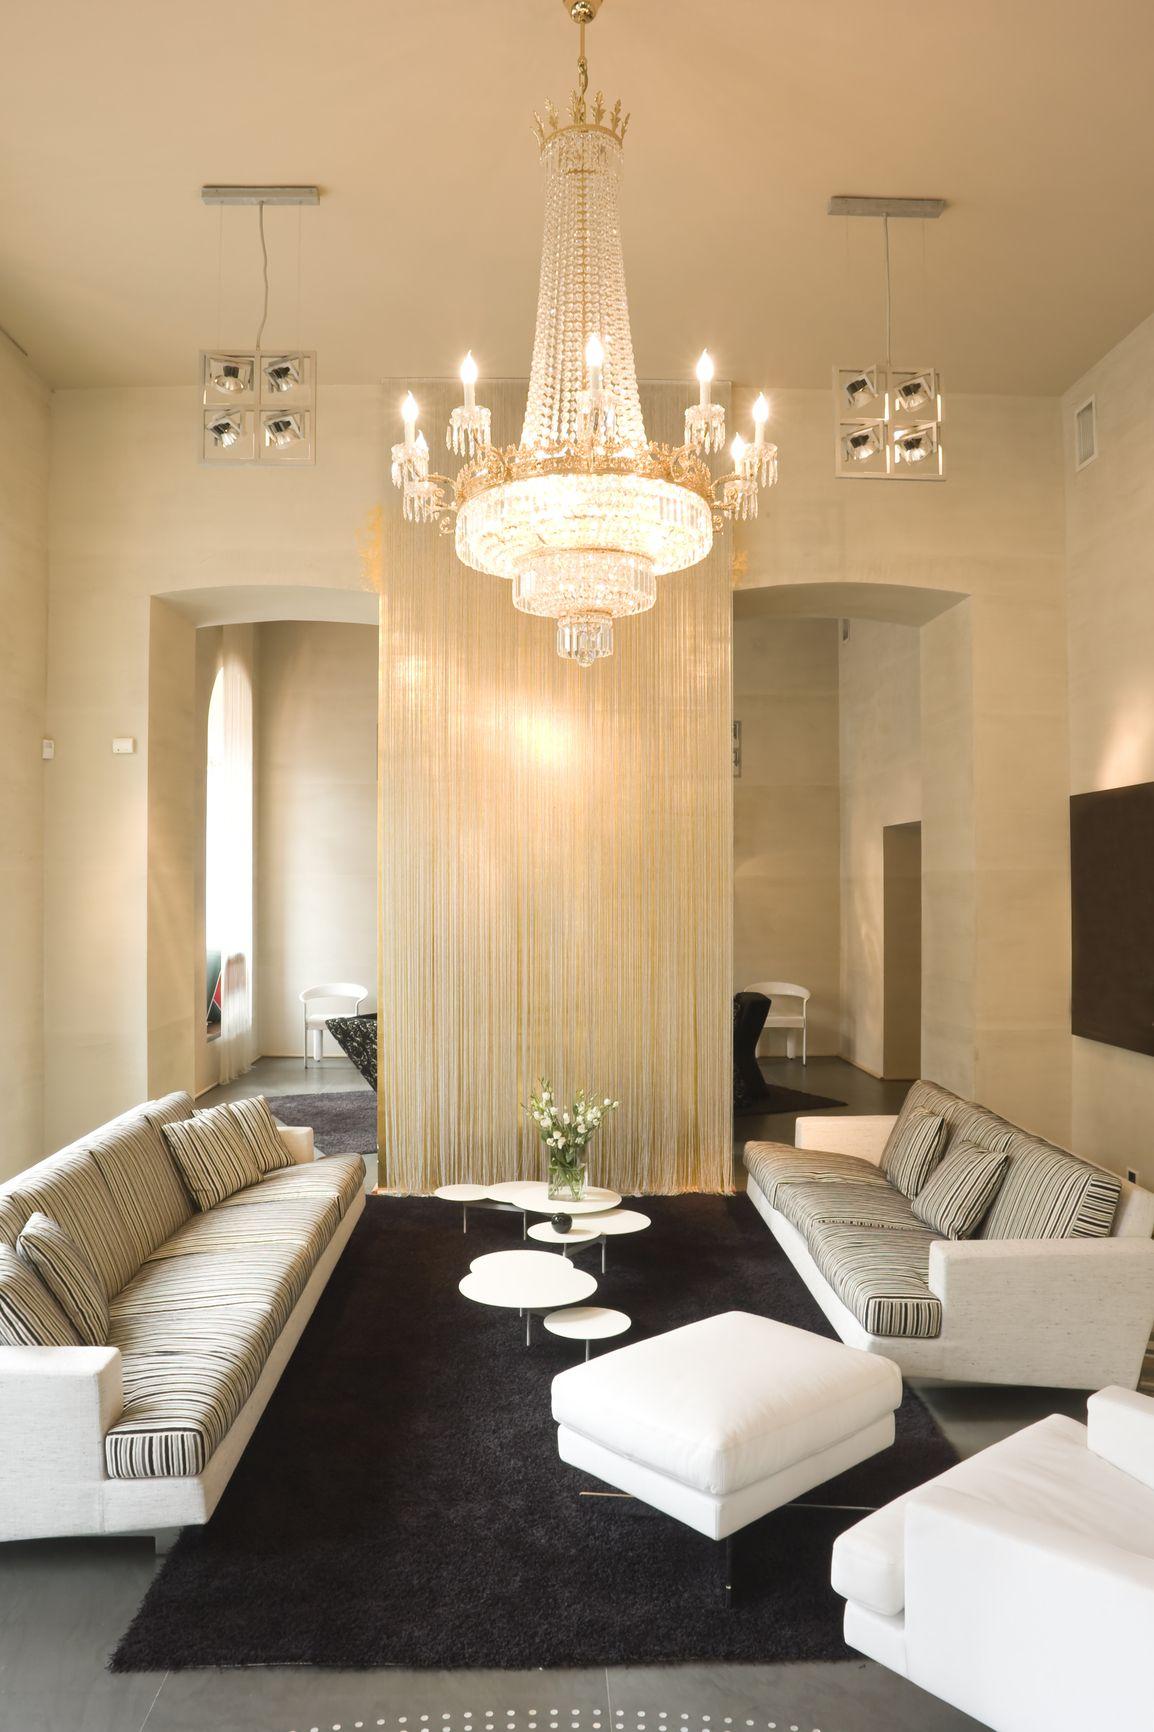 101 Beautiful Formal Living Room Ideas Photos Formal Living Room Designs Furniture Design Living Room Small Living Room Design